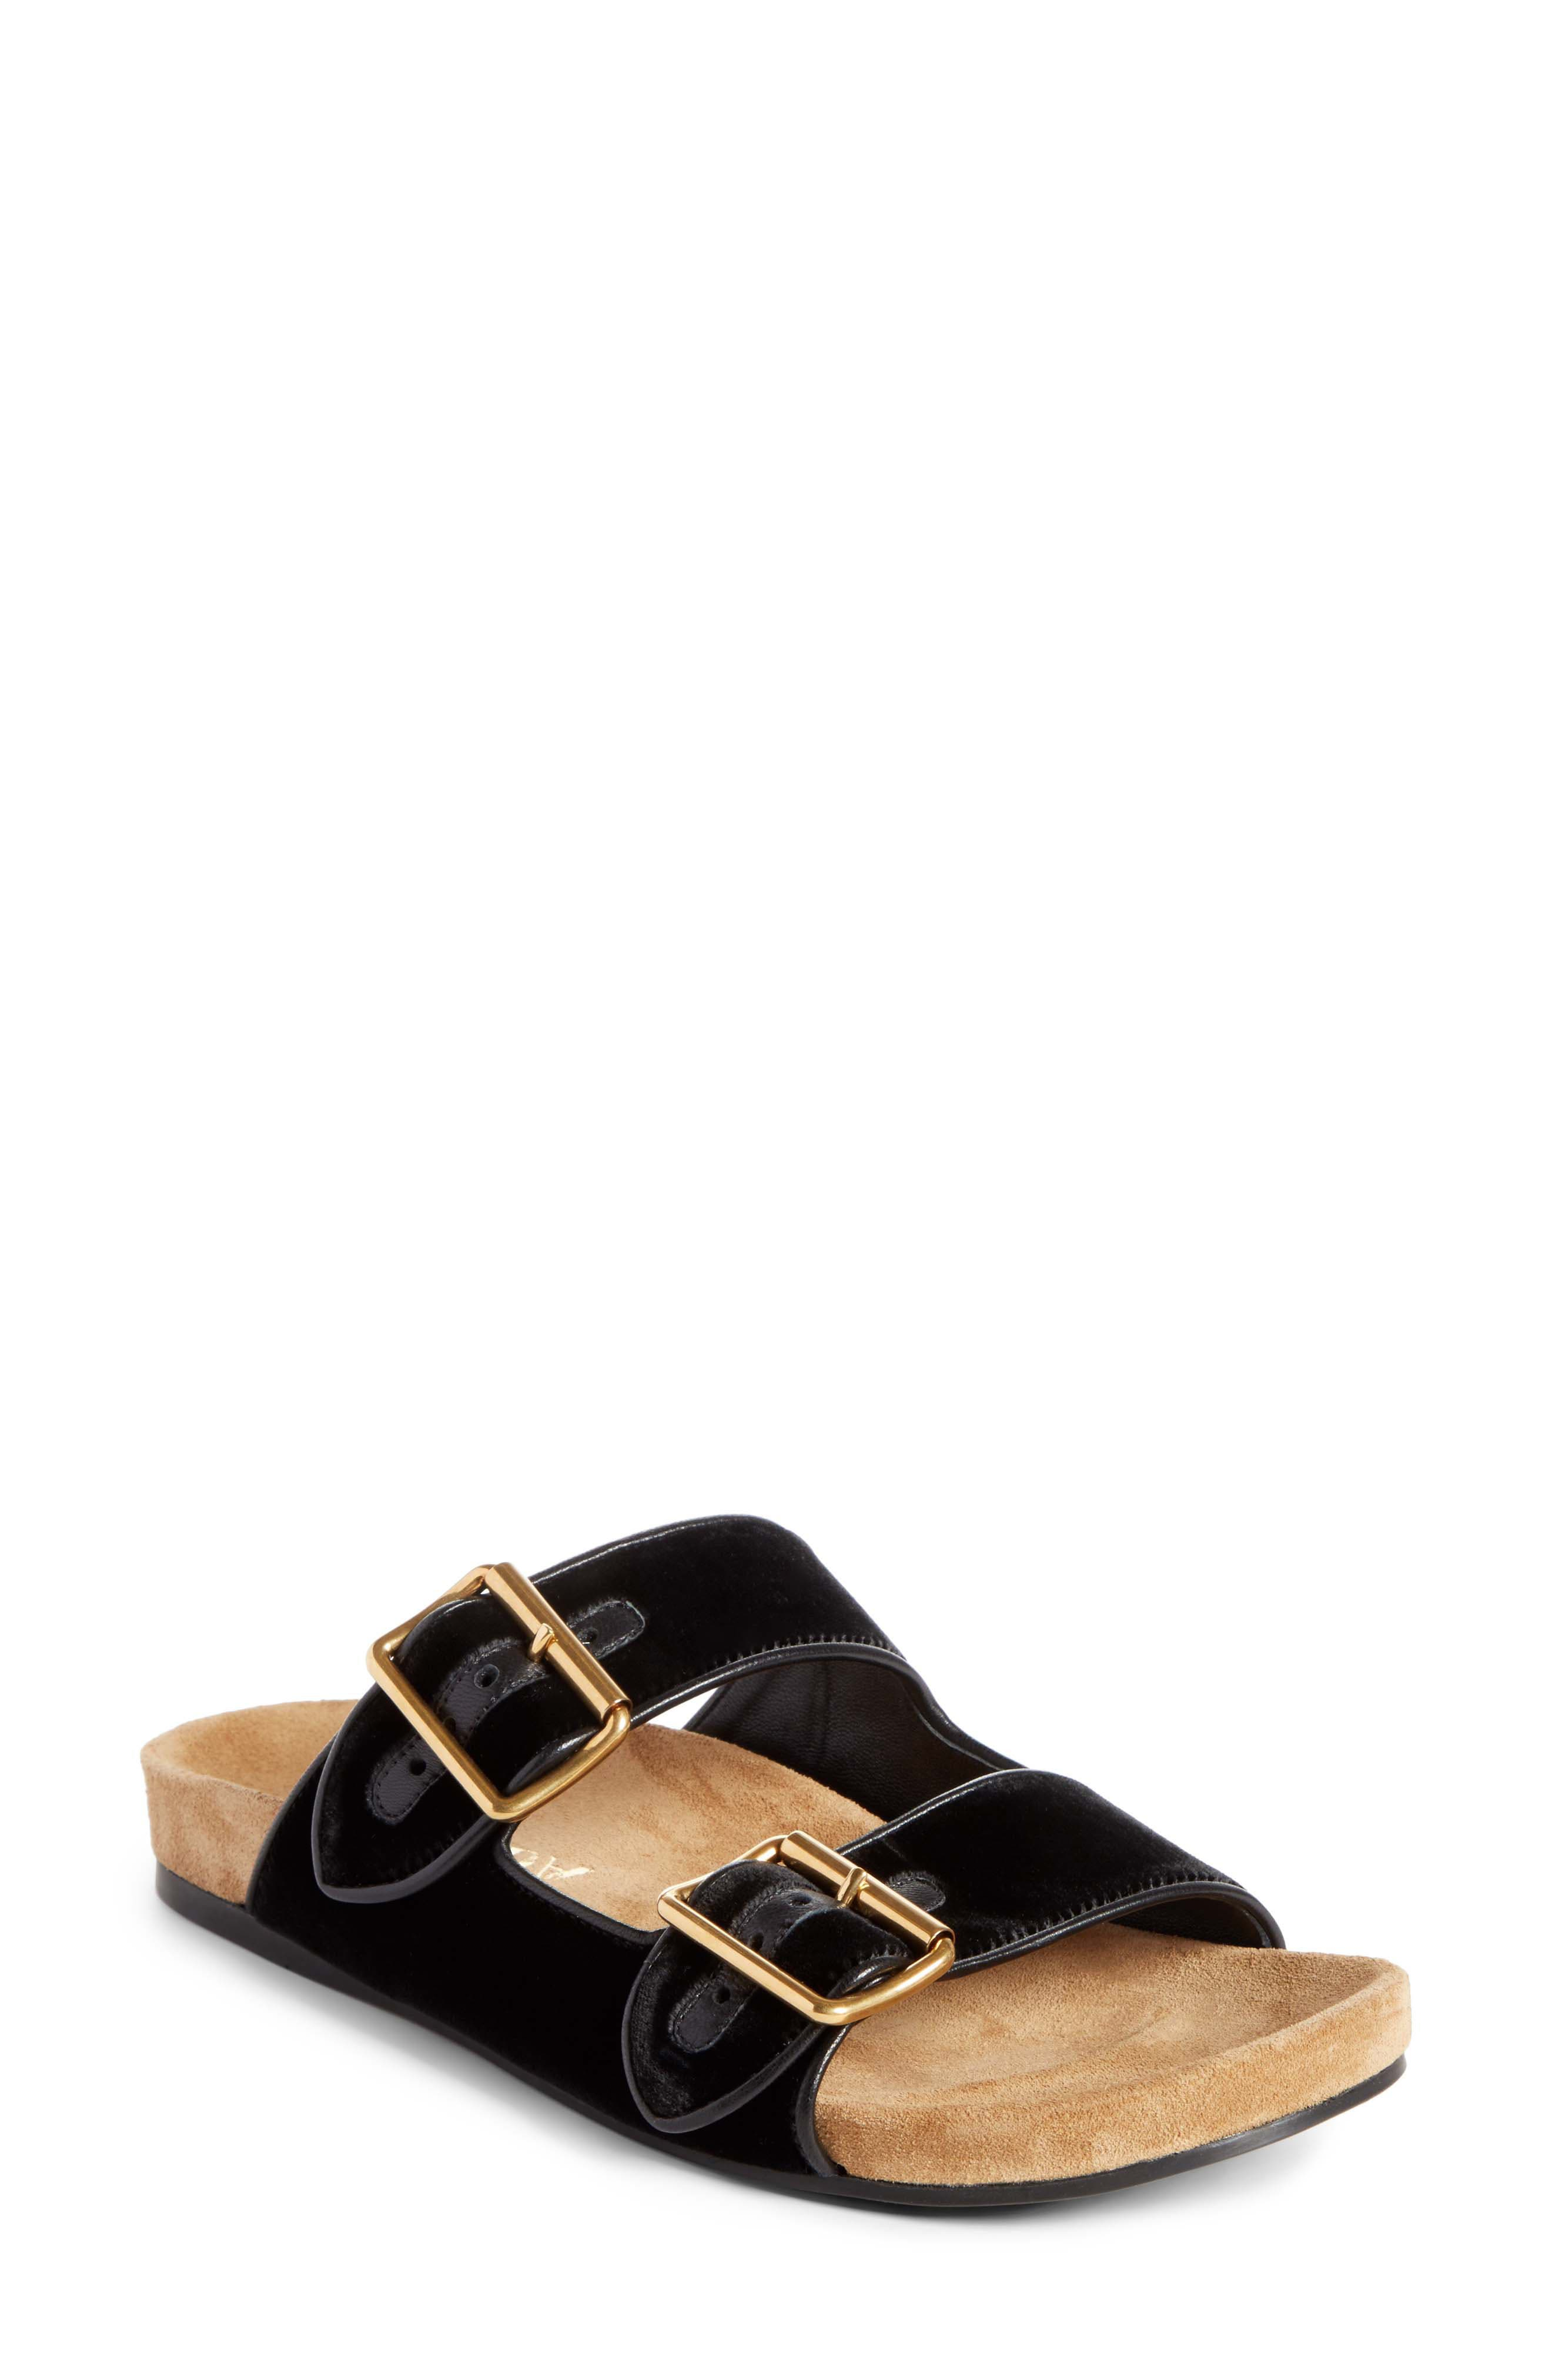 PRADA Slide Sandal, Main, color, 001